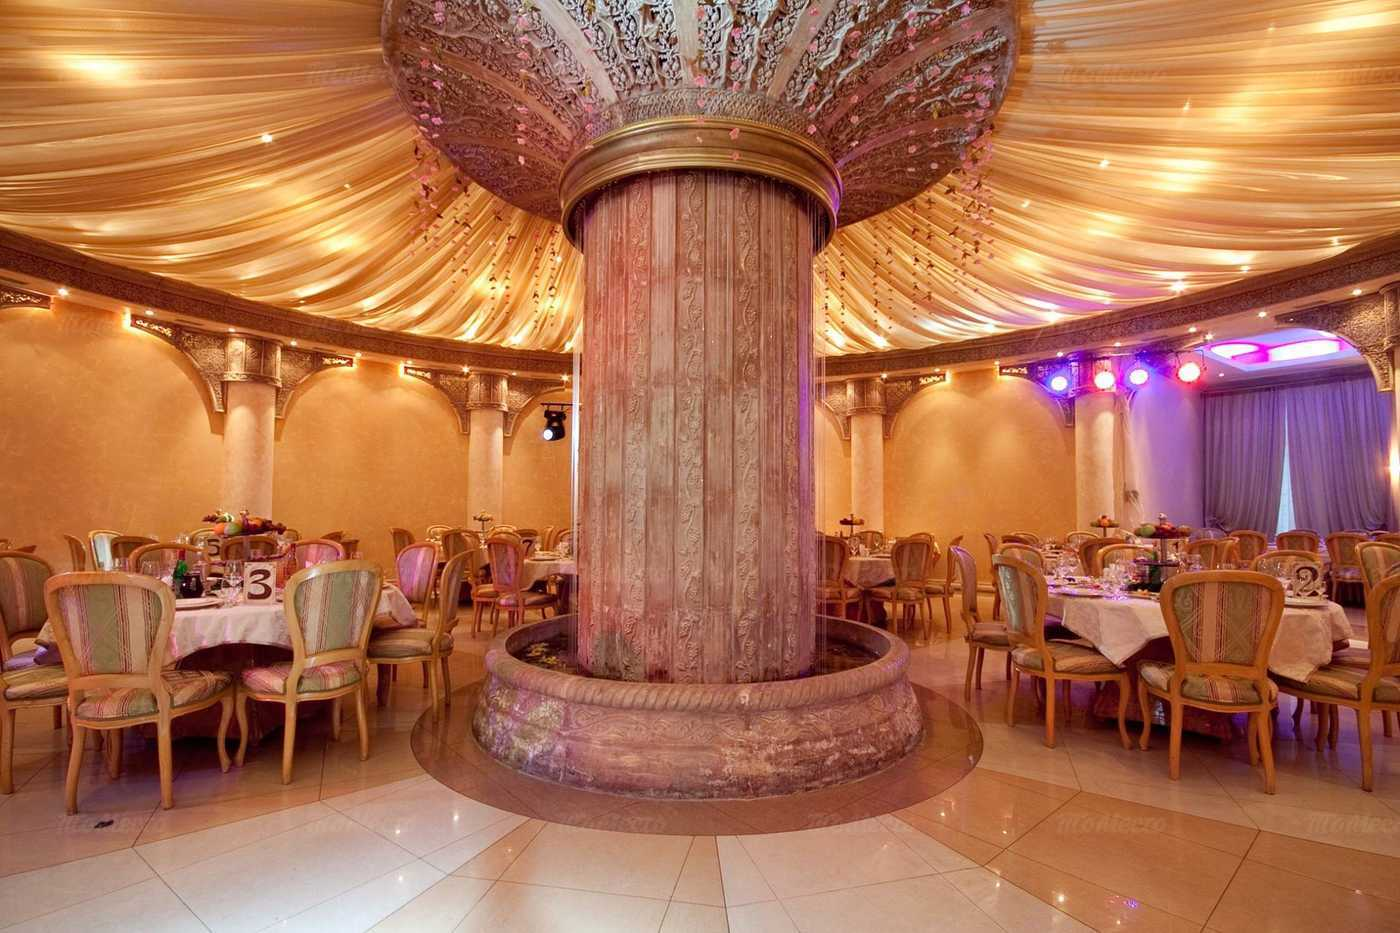 Ресторан Любимый Хабиб на проспекте Стачек фото 8